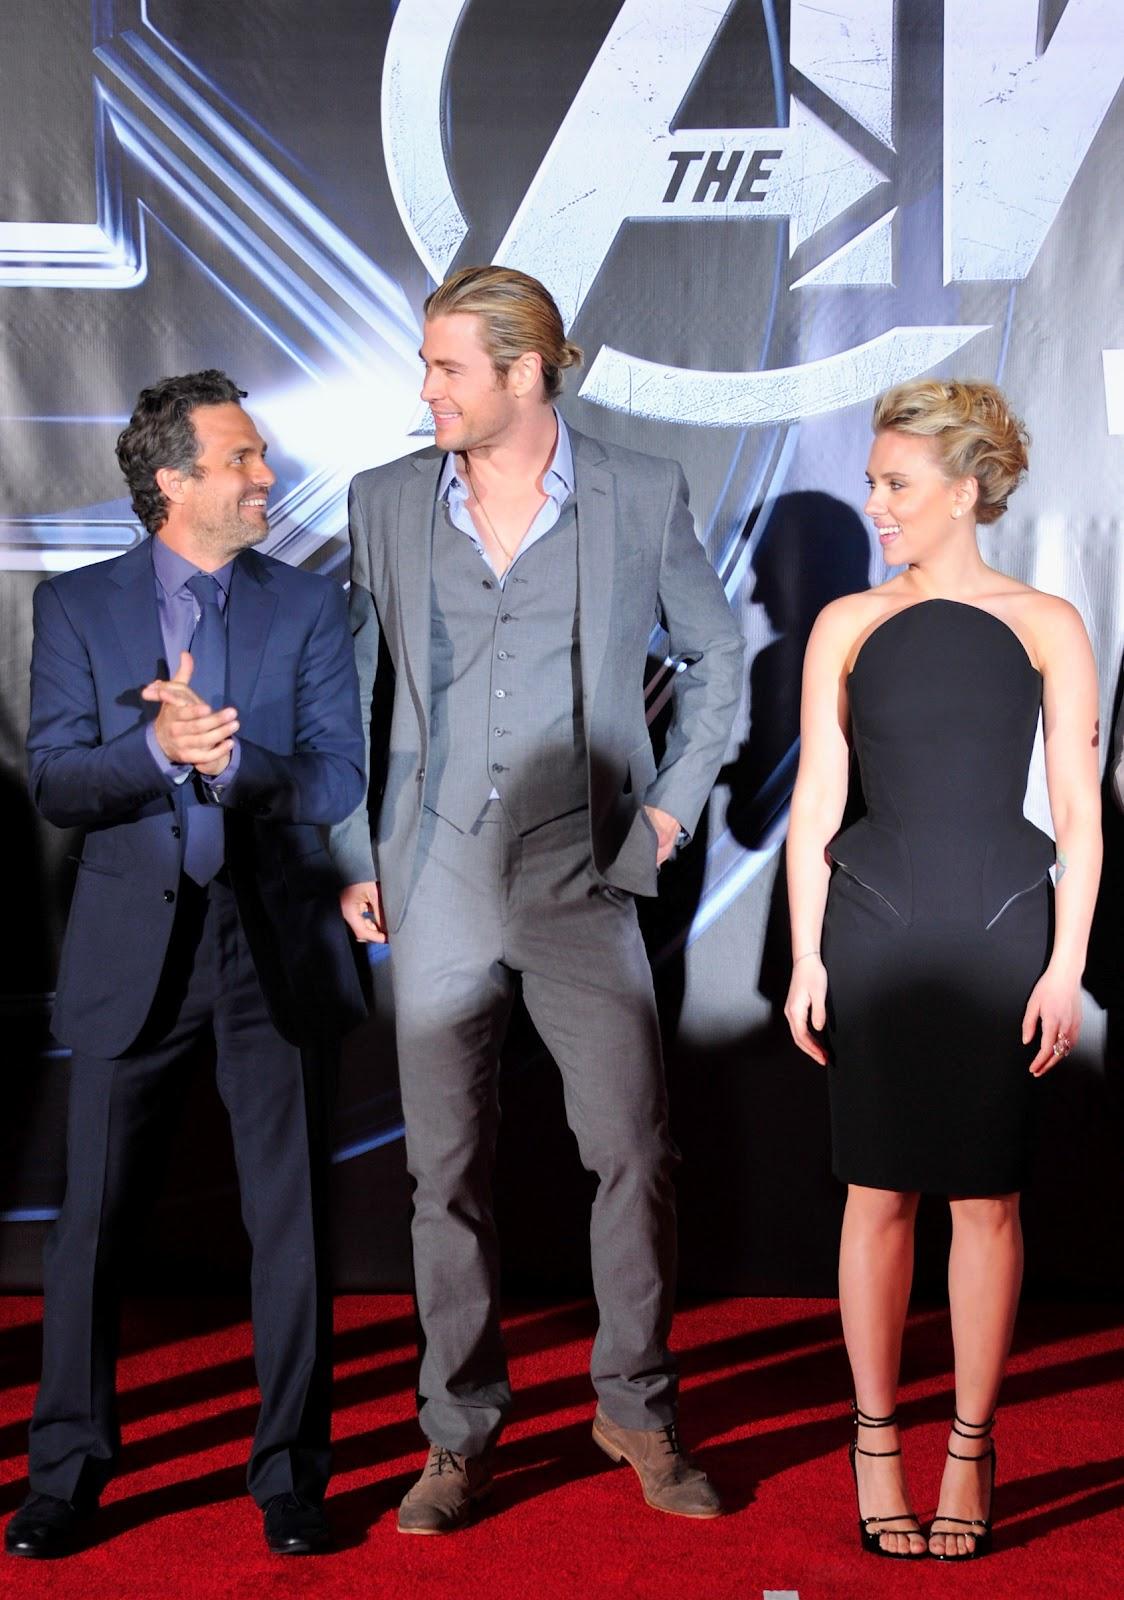 http://3.bp.blogspot.com/-eParOIW6w1w/T4iKkJ8D4BI/AAAAAAAABJY/Bgignp4mKRI/s1600/Avengers+US+Premiere.+Robert+Downey+jr+Chris+Hemsworth+Scarlett+Johansson.JPG